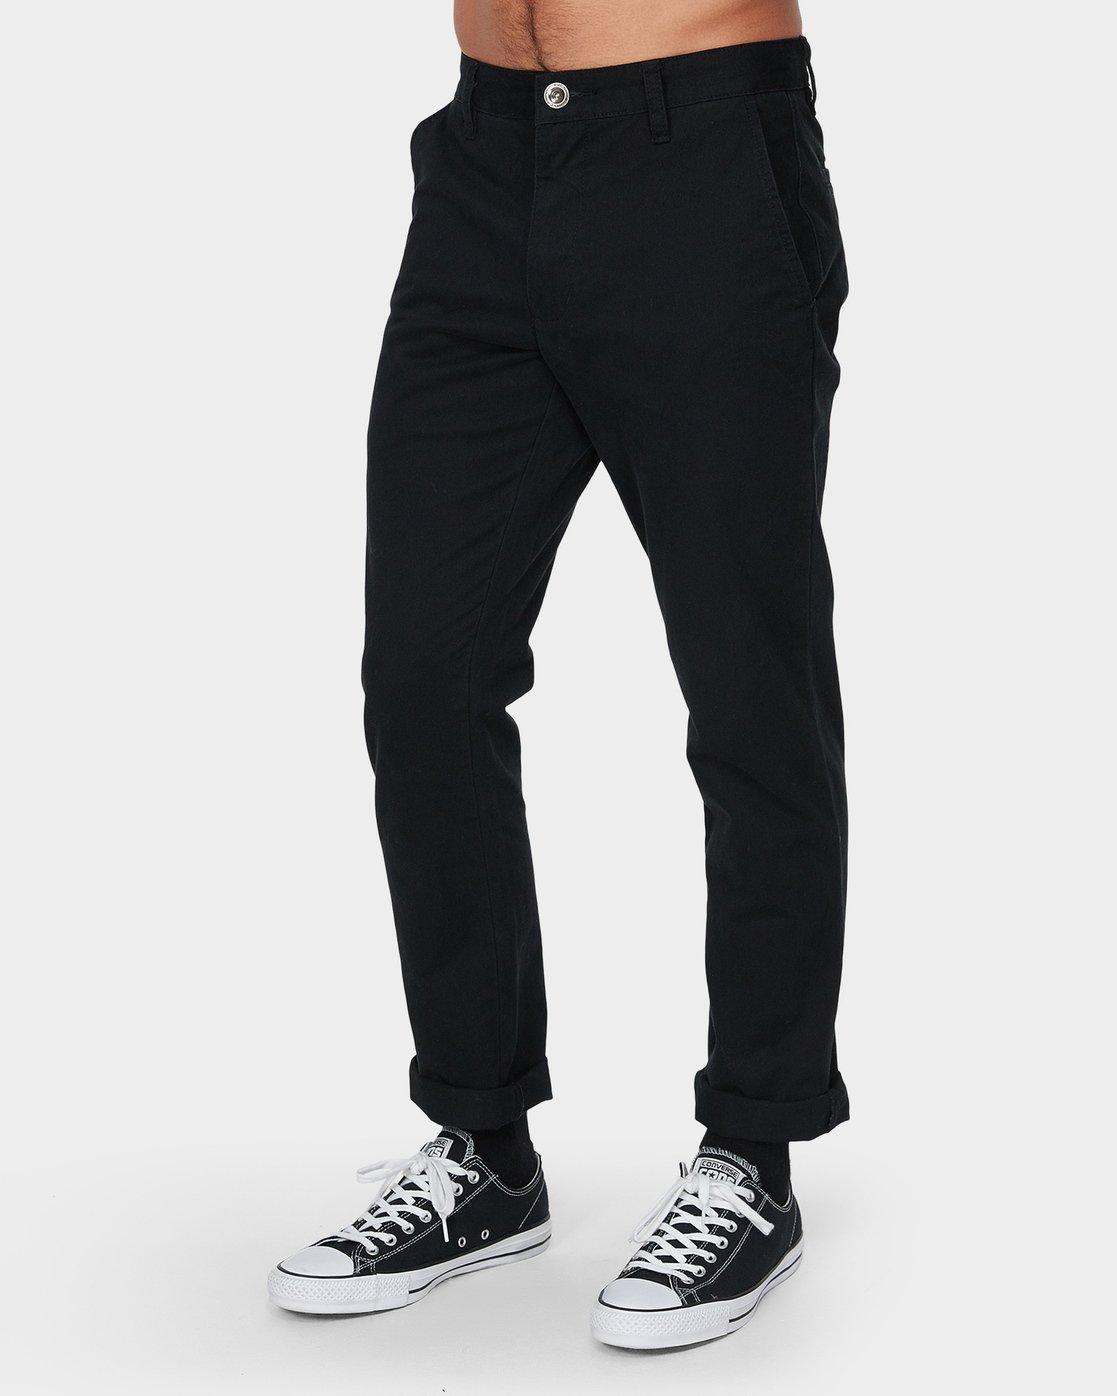 0 Weekday Stretch Pant Black R593271 RVCA